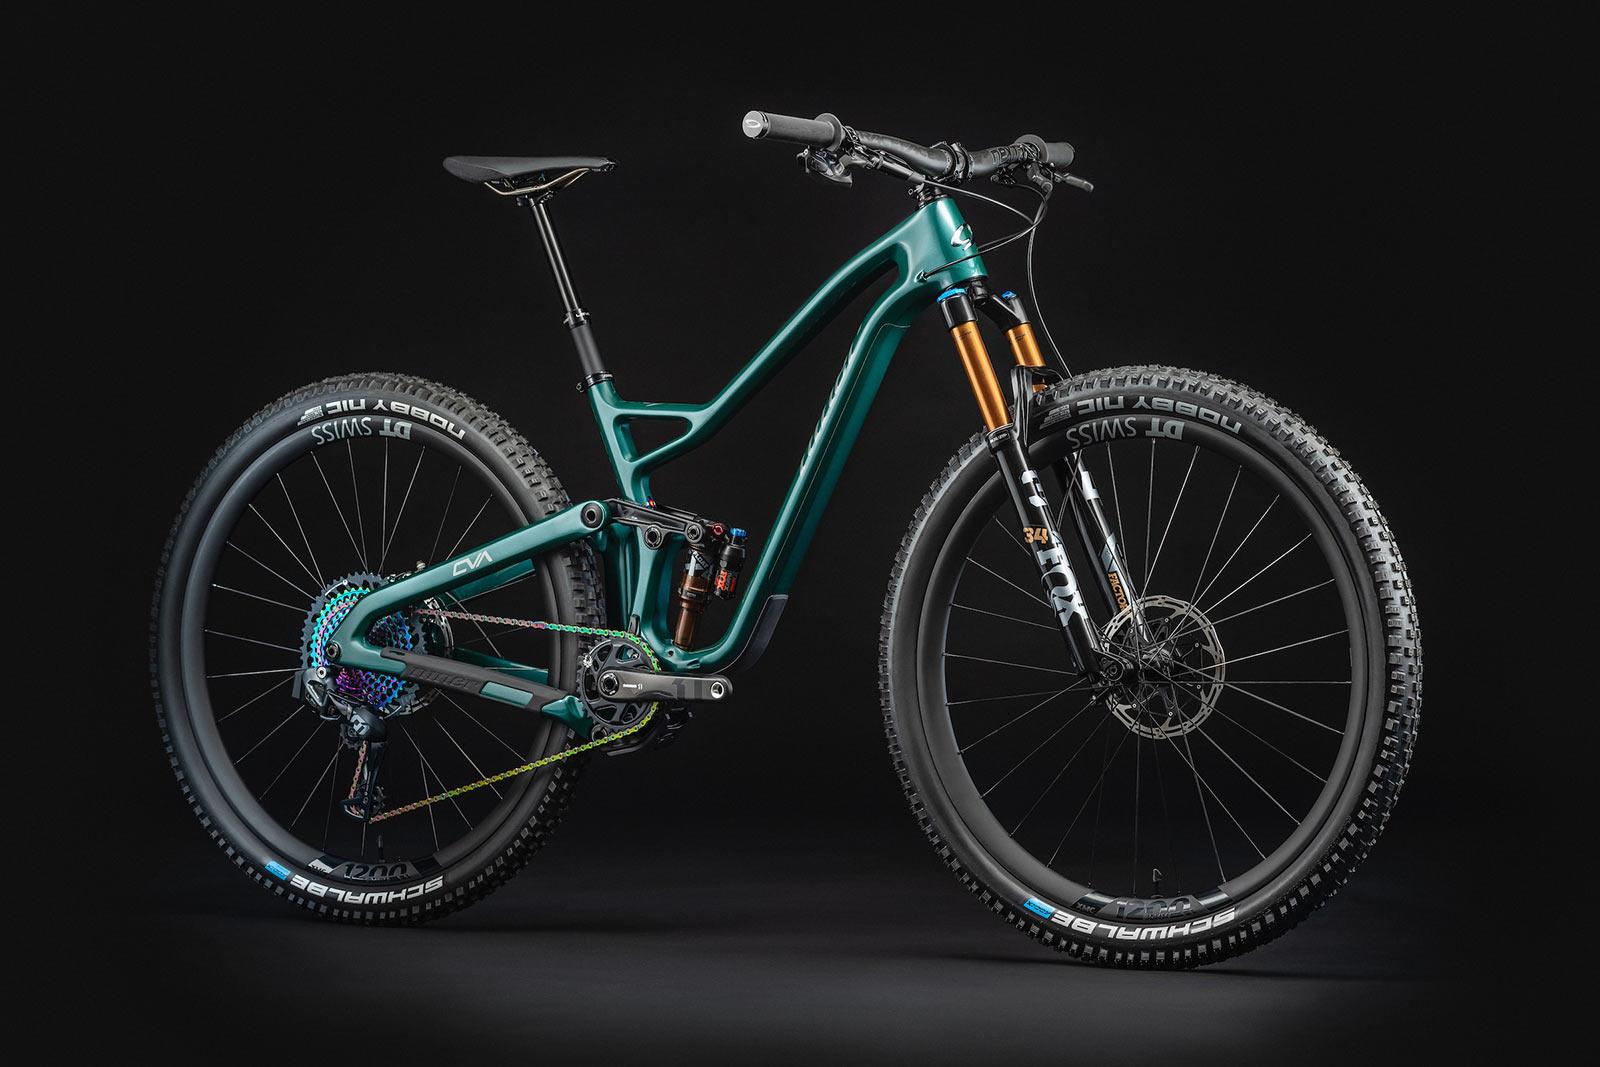 new niner jet 9 rdo trail mountain bike closeup frame details